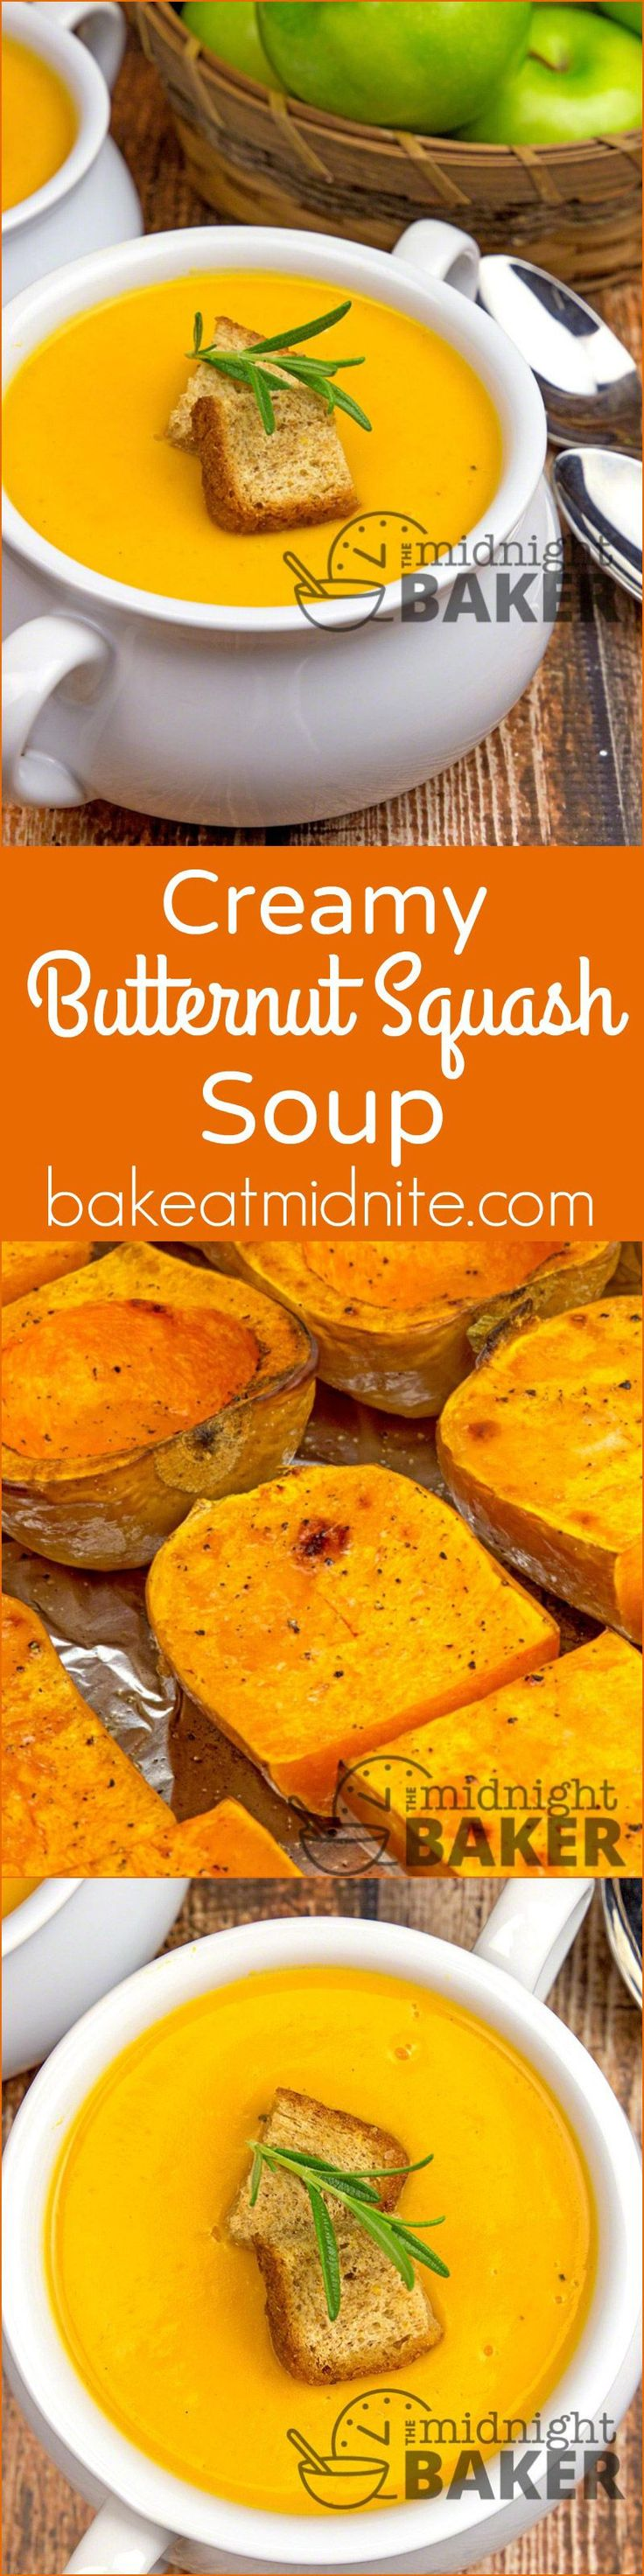 utternut Squash Soup